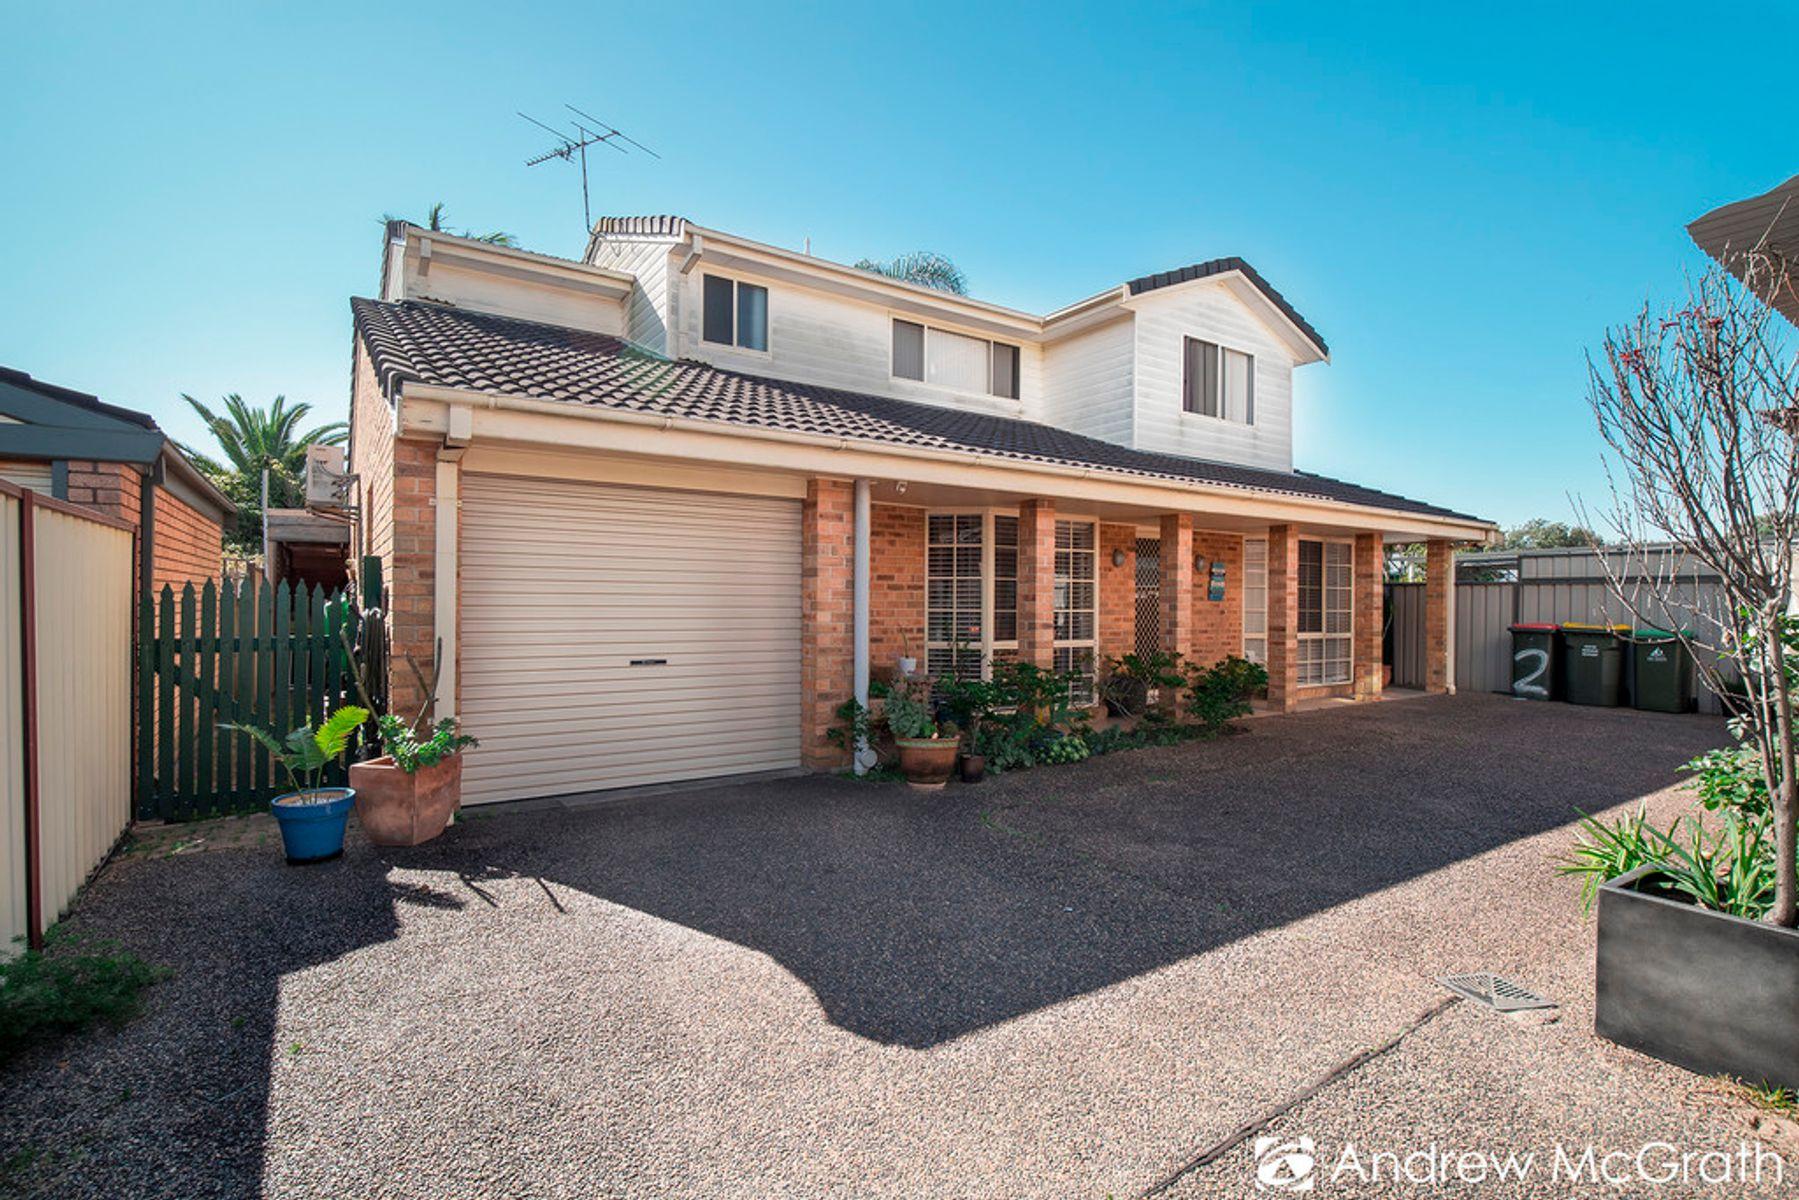 2/11 Tirril Street, Blacksmiths, NSW 2281